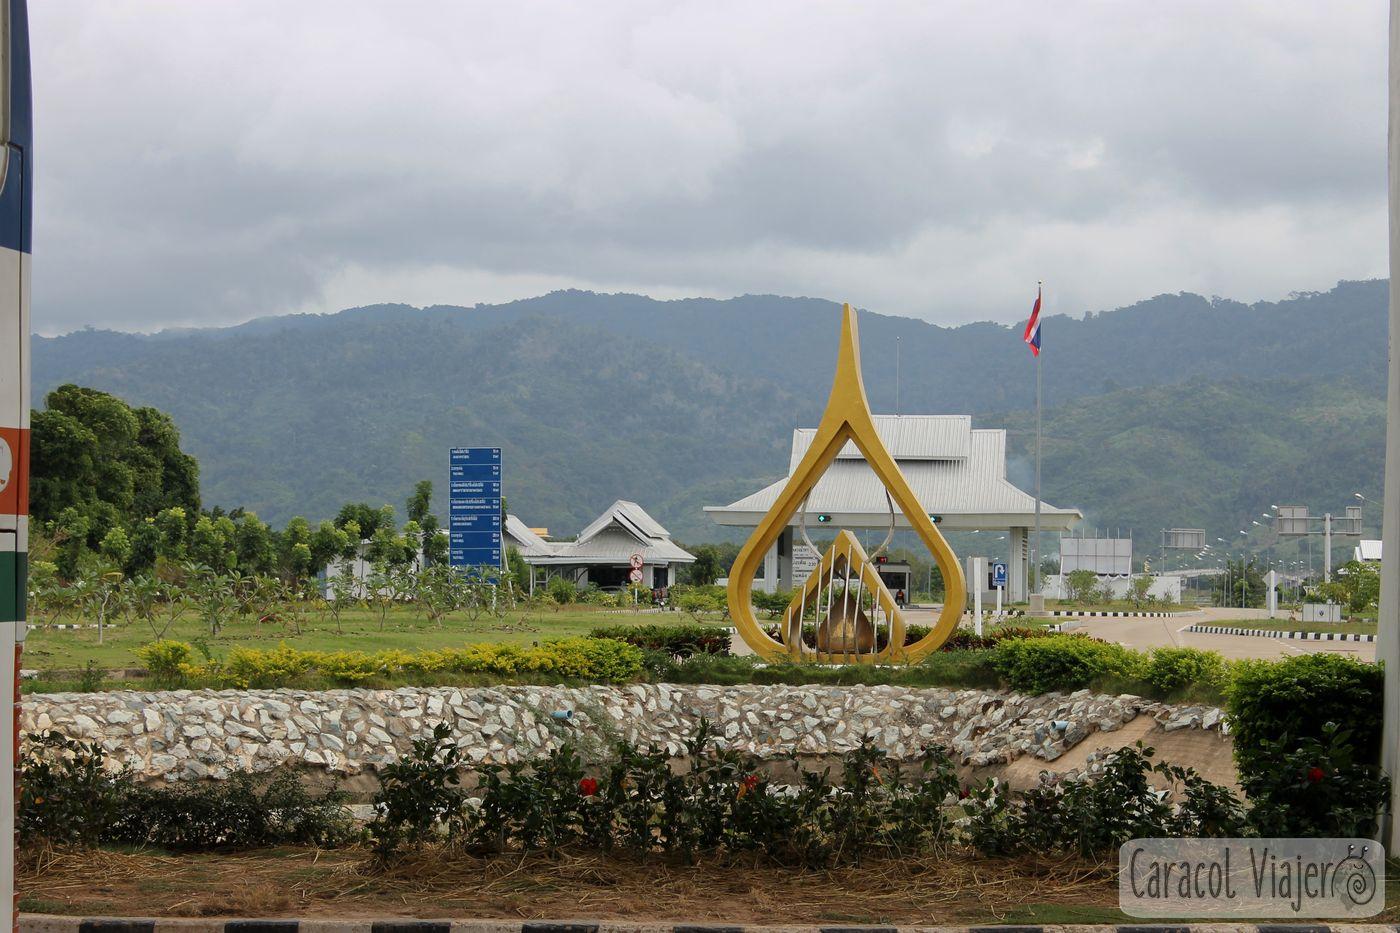 Adiós a Tailandia frontera con Laos